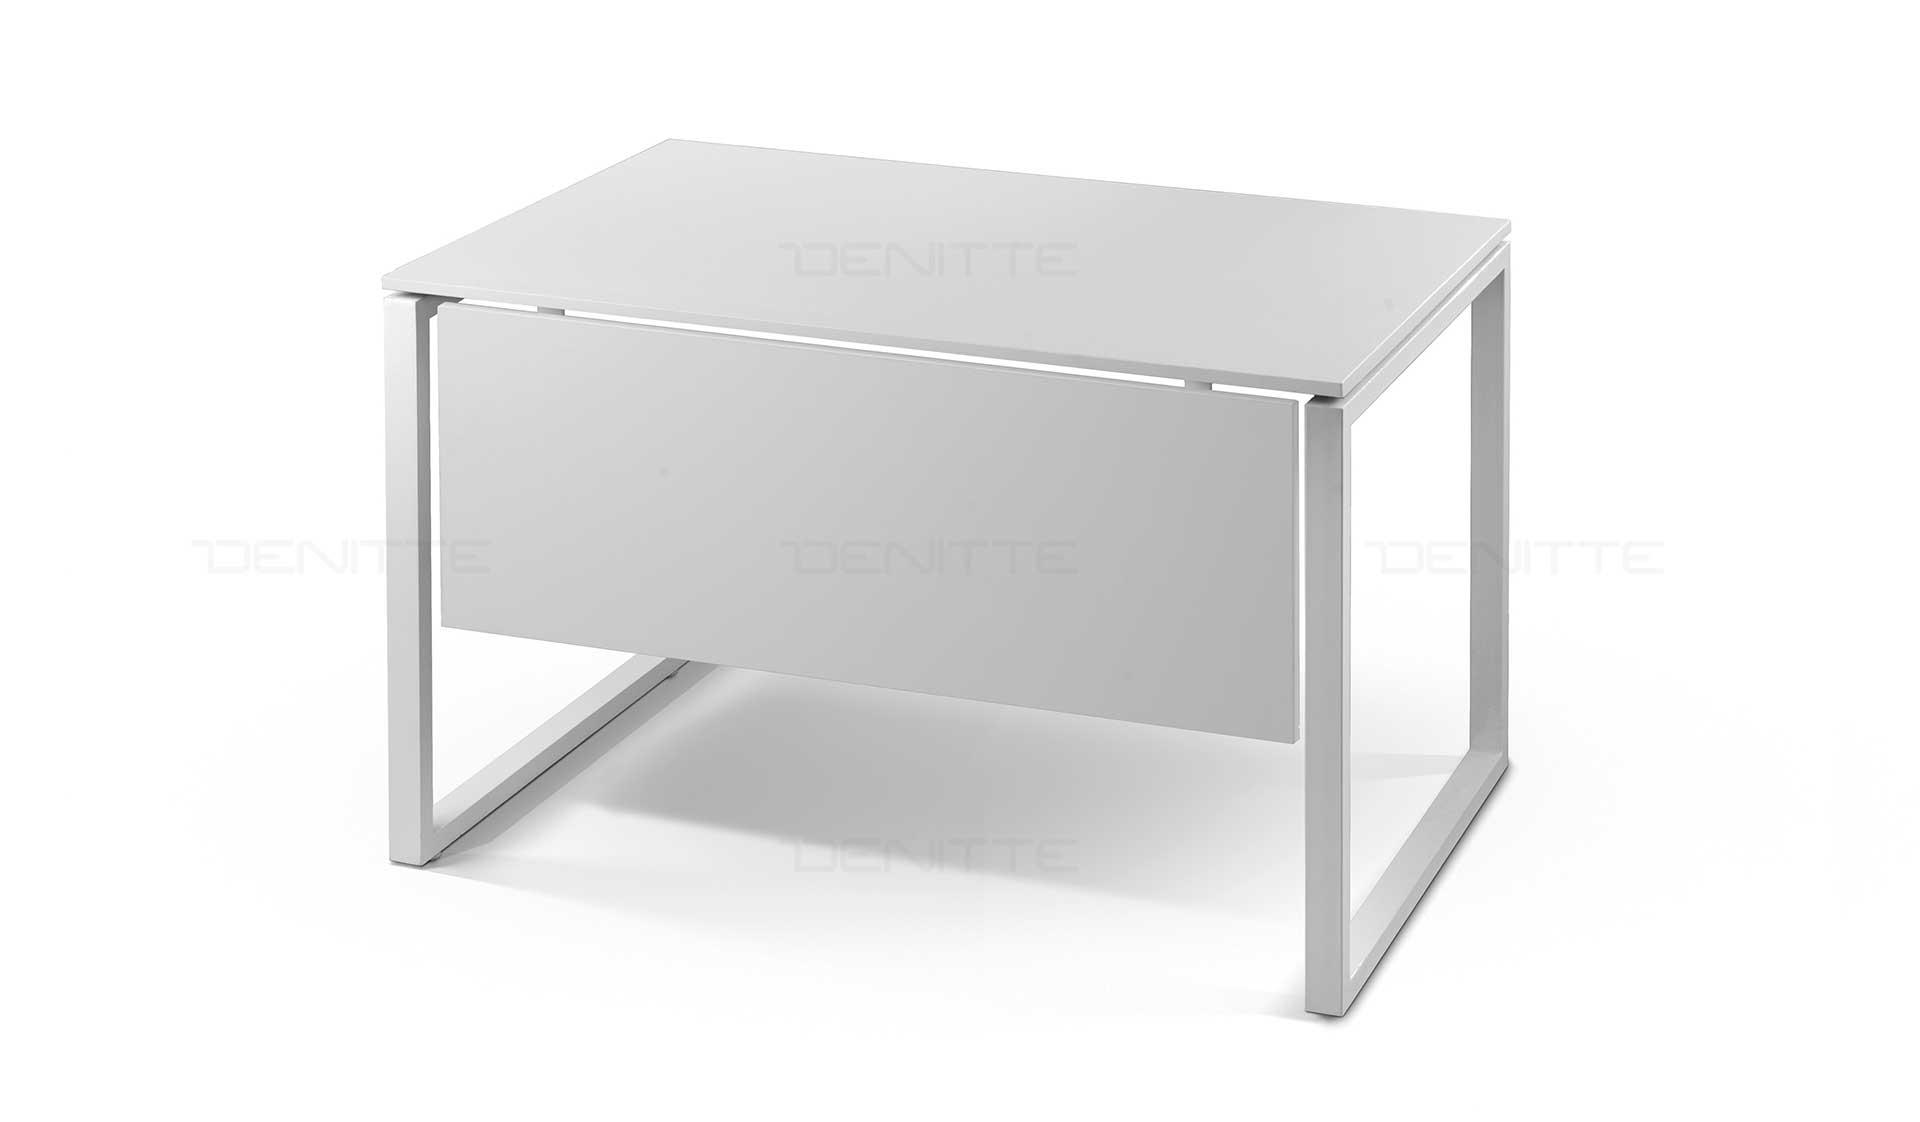 میز کامپیوتردنیته